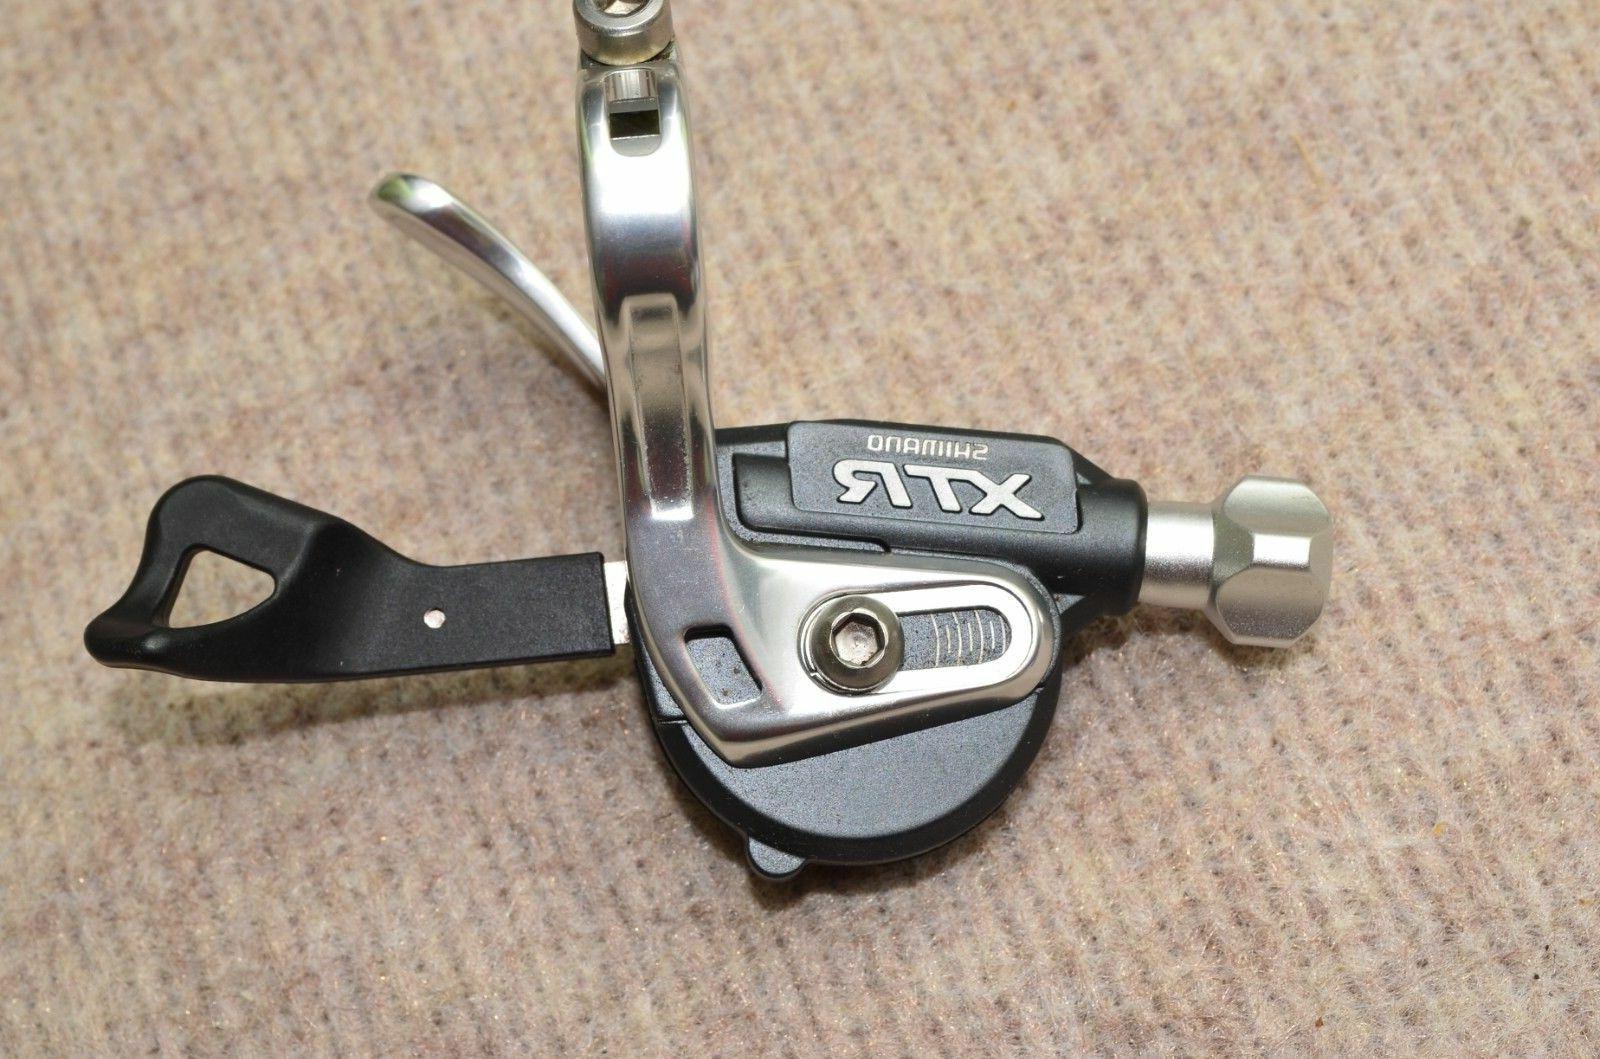 Shimano XTR SL-M970 Index Shifter Shifters 9-speed 2x 3x9 Tr